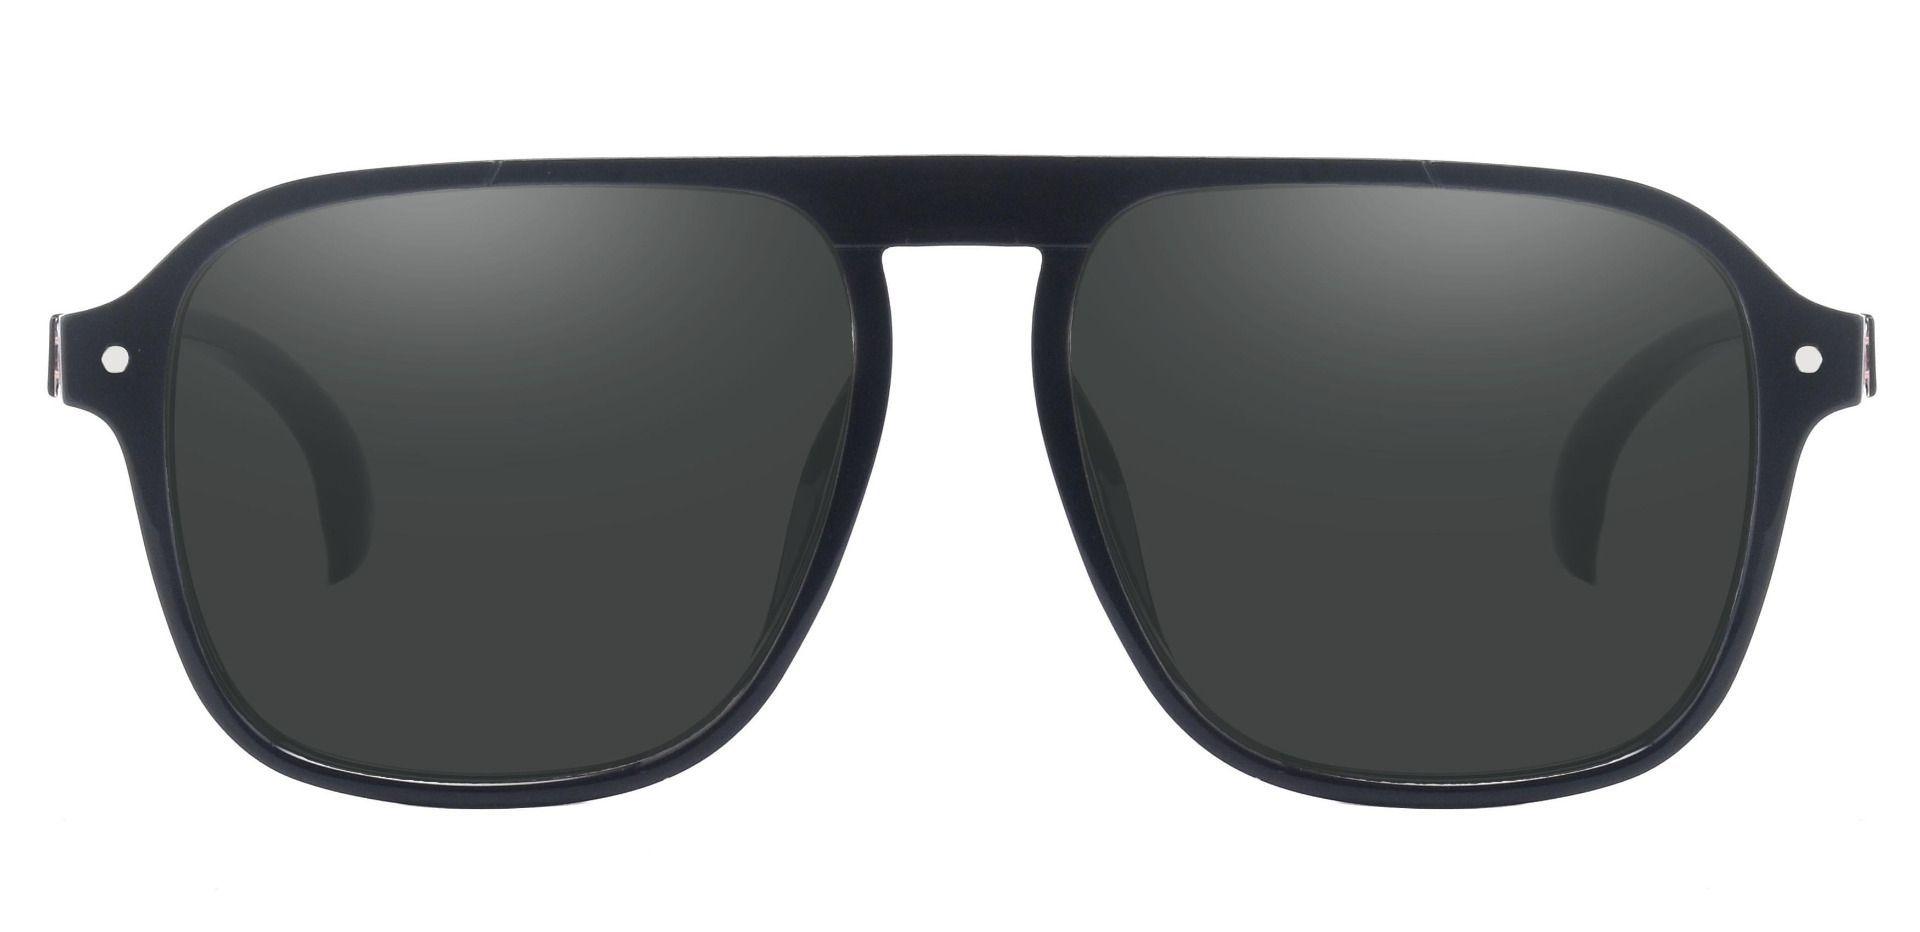 Gideon Aviator Non-Rx Sunglasses - Black Frame With Gray Lenses